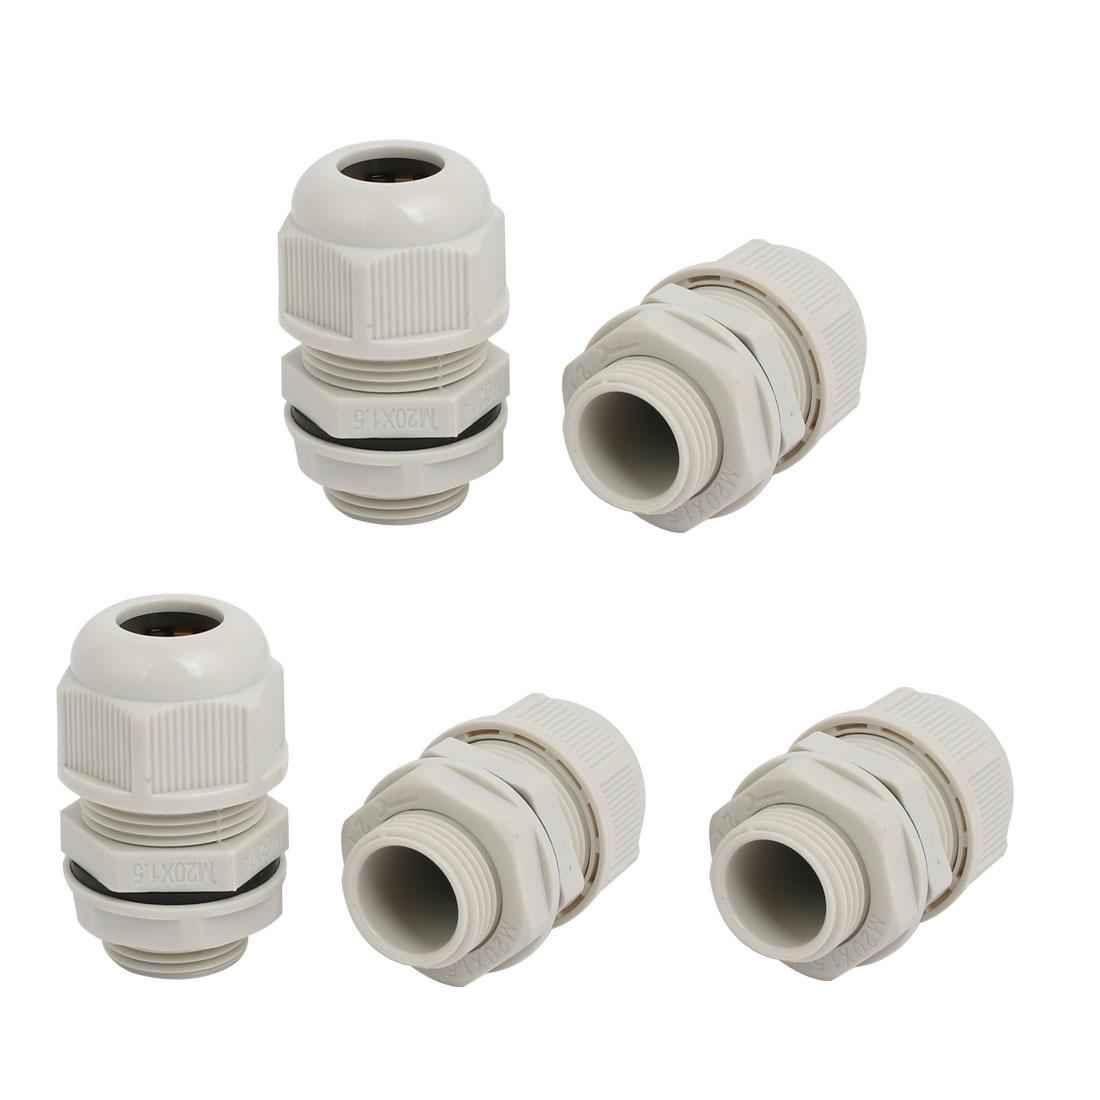 M20x1.5mm 3mm-5.2mm Range Nylon 3 Holes Adjustable Cables Gland Gray 5pcs